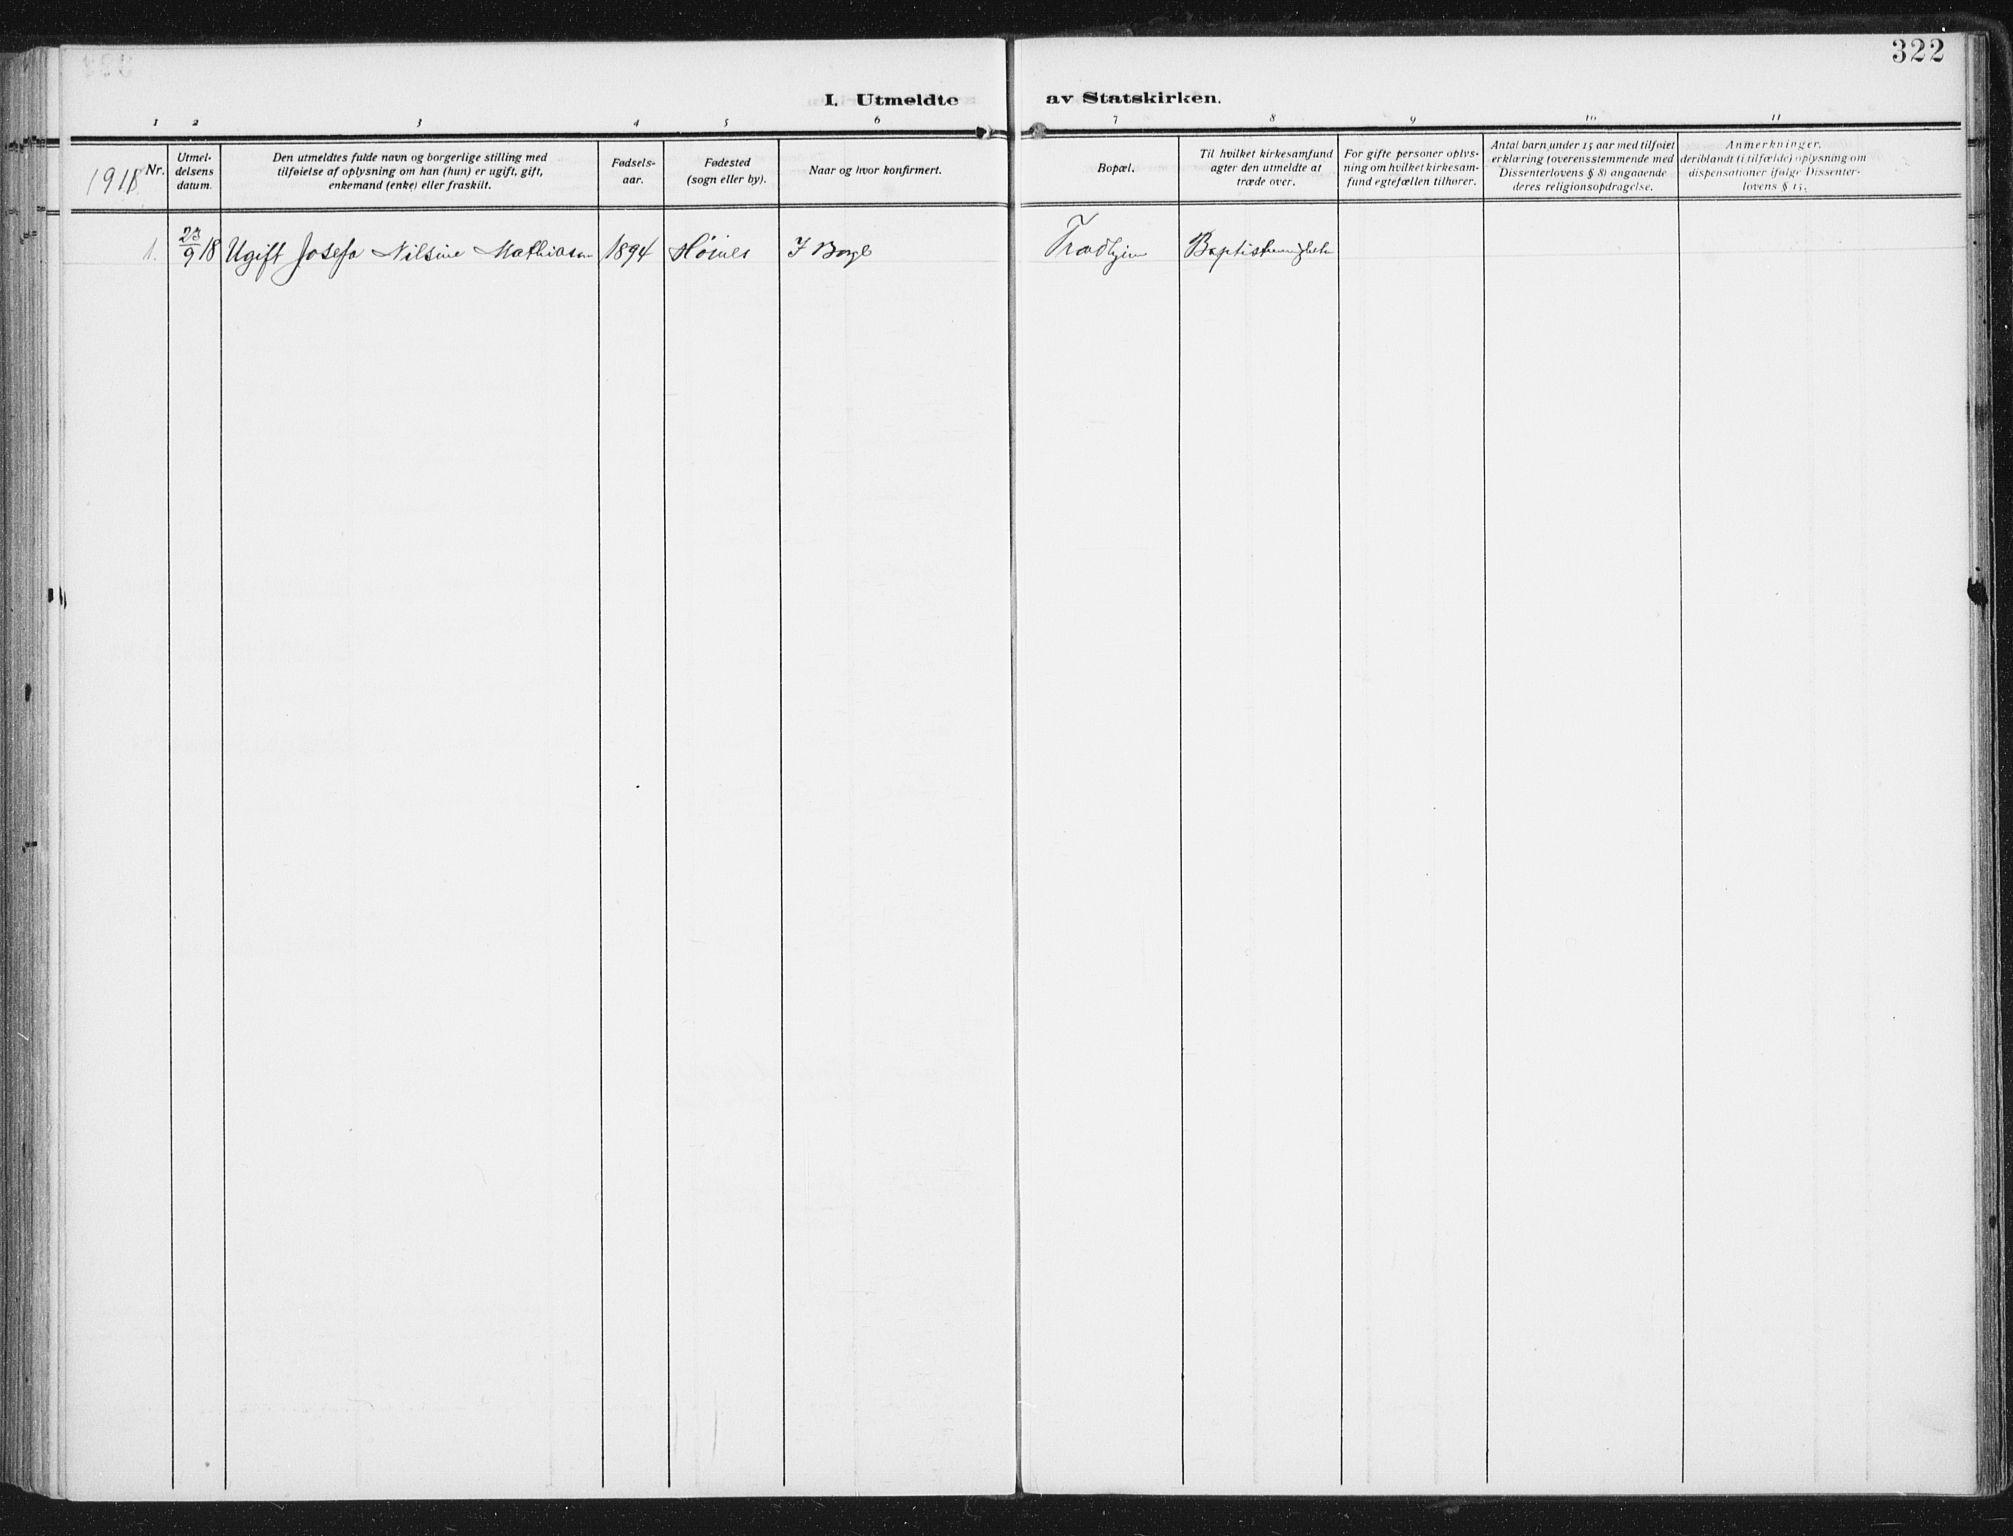 SAT, Ministerialprotokoller, klokkerbøker og fødselsregistre - Nordland, 880/L1135: Ministerialbok nr. 880A09, 1908-1919, s. 322